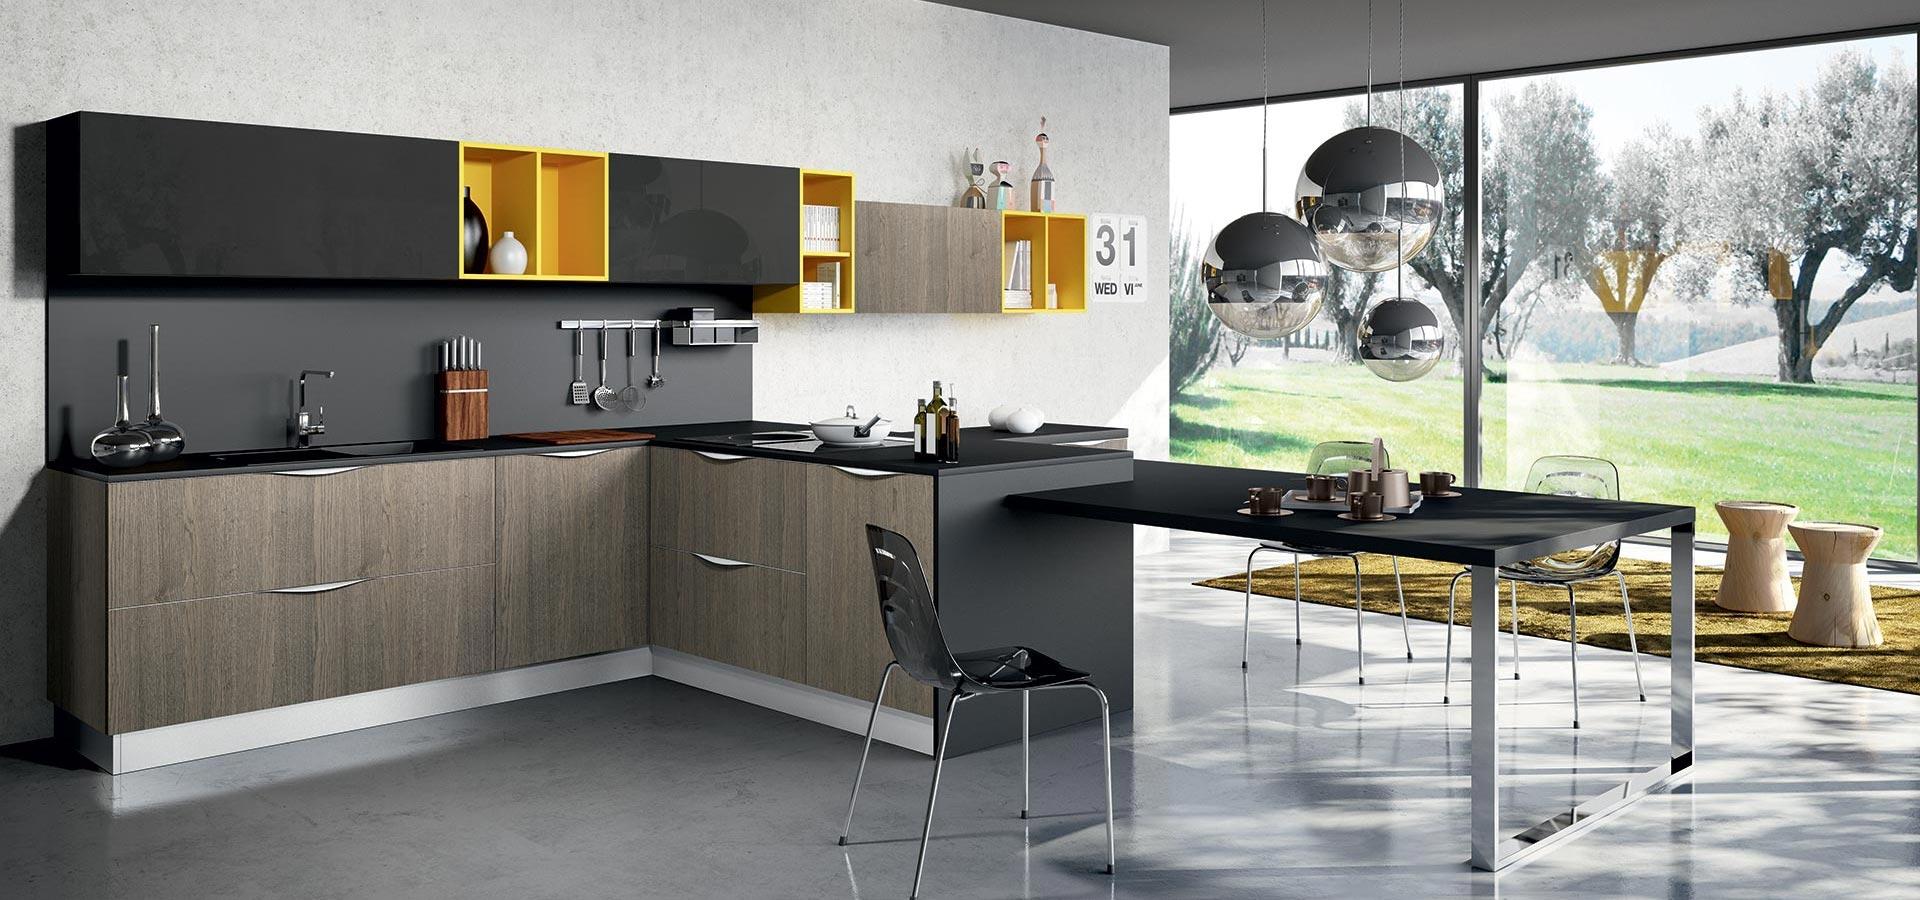 Arredo3 cucina round in laminato finitura rovere cucine - Arredo cucine moderne ...